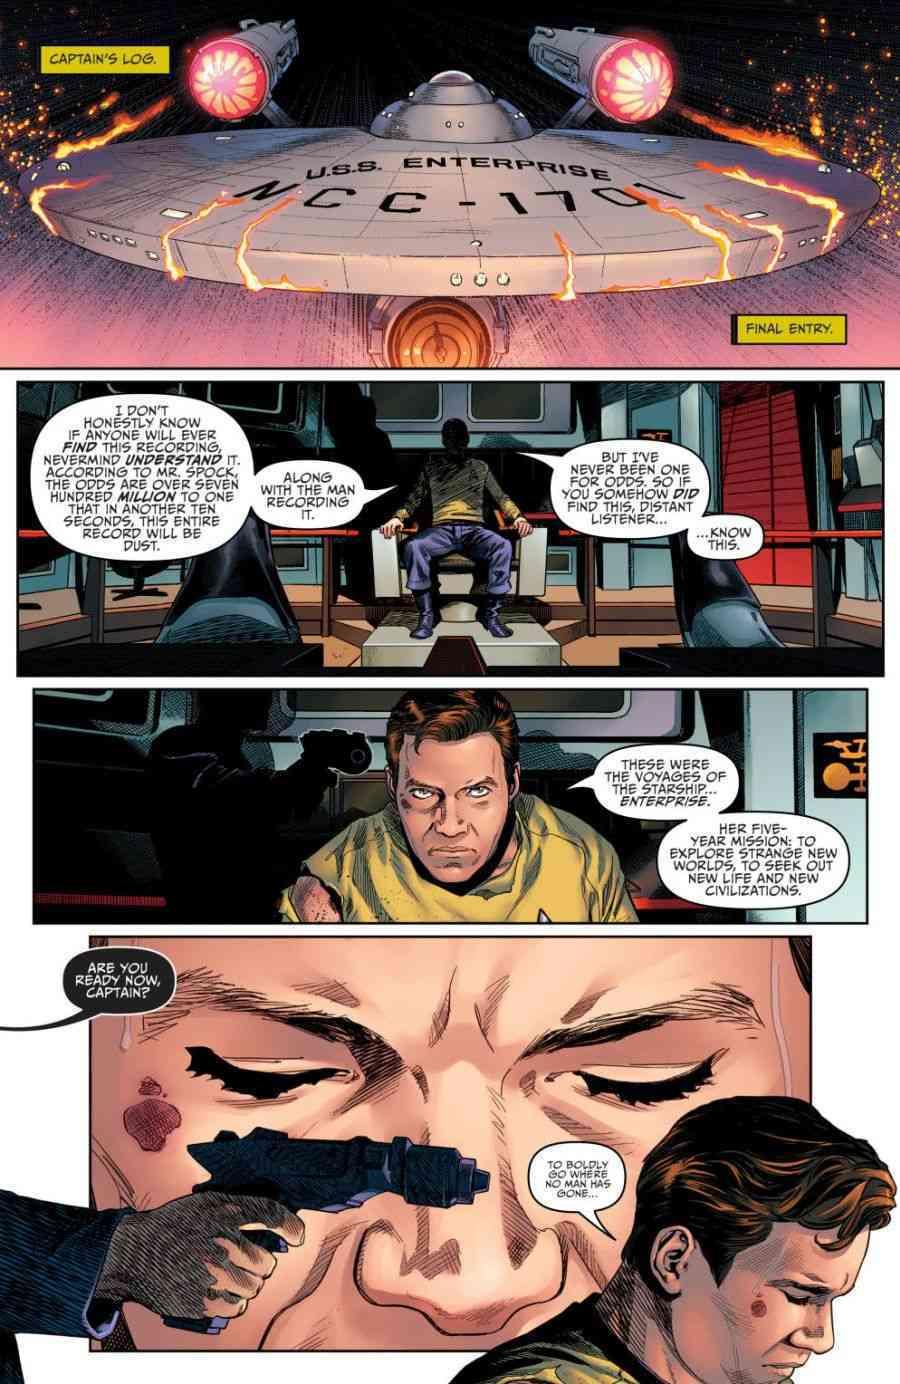 Star_Trek_Year_Five-01-pr (1)_3